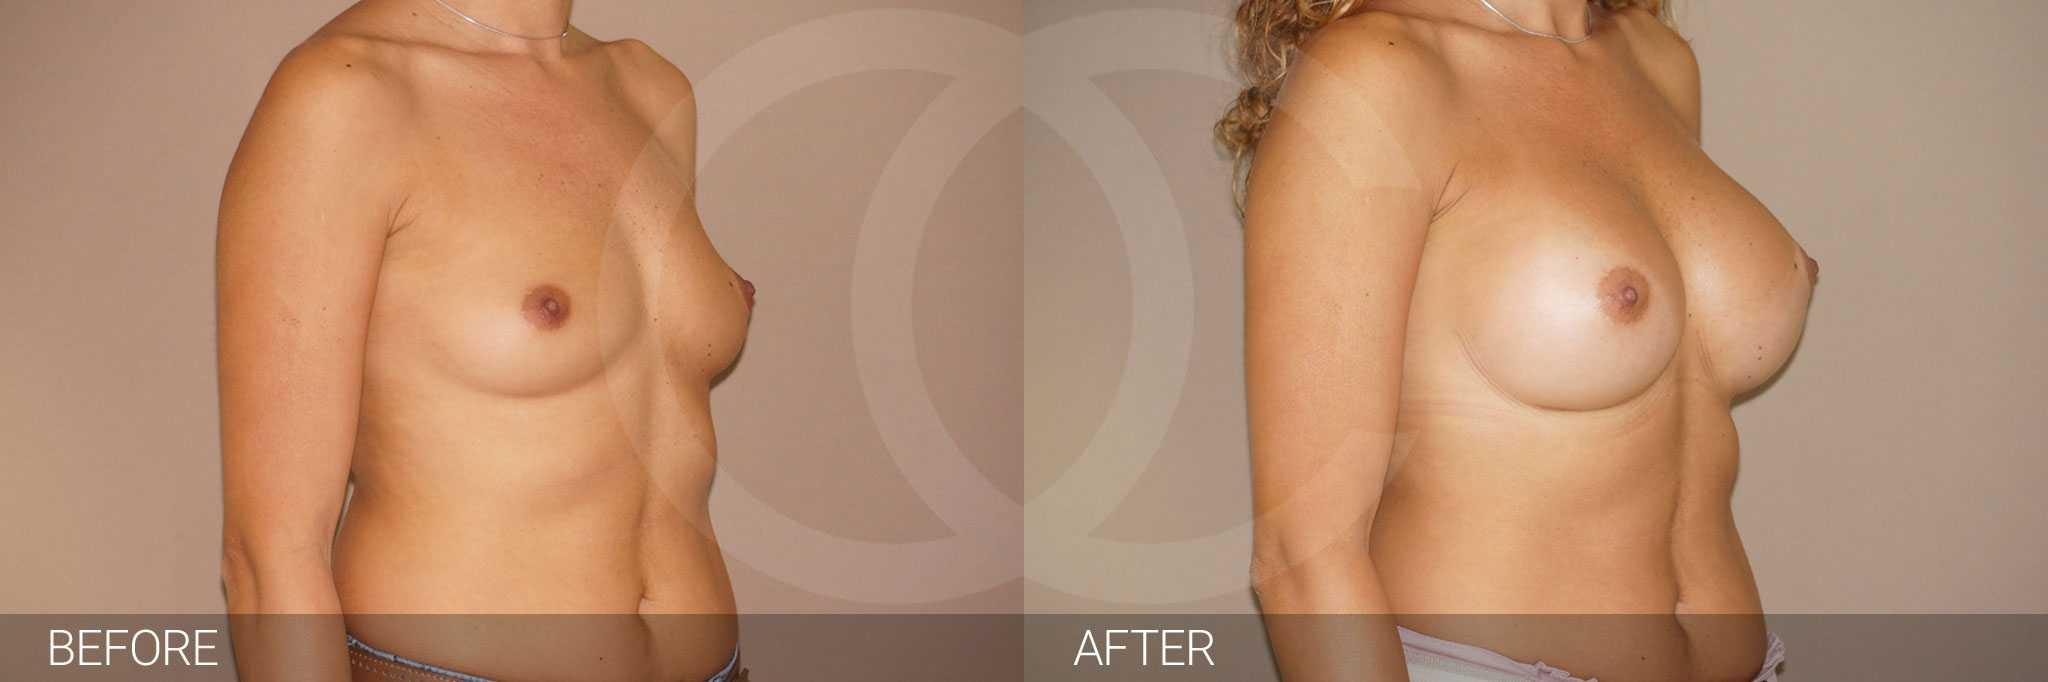 Augmentation mammaire Implants mammaires ante/post-op II